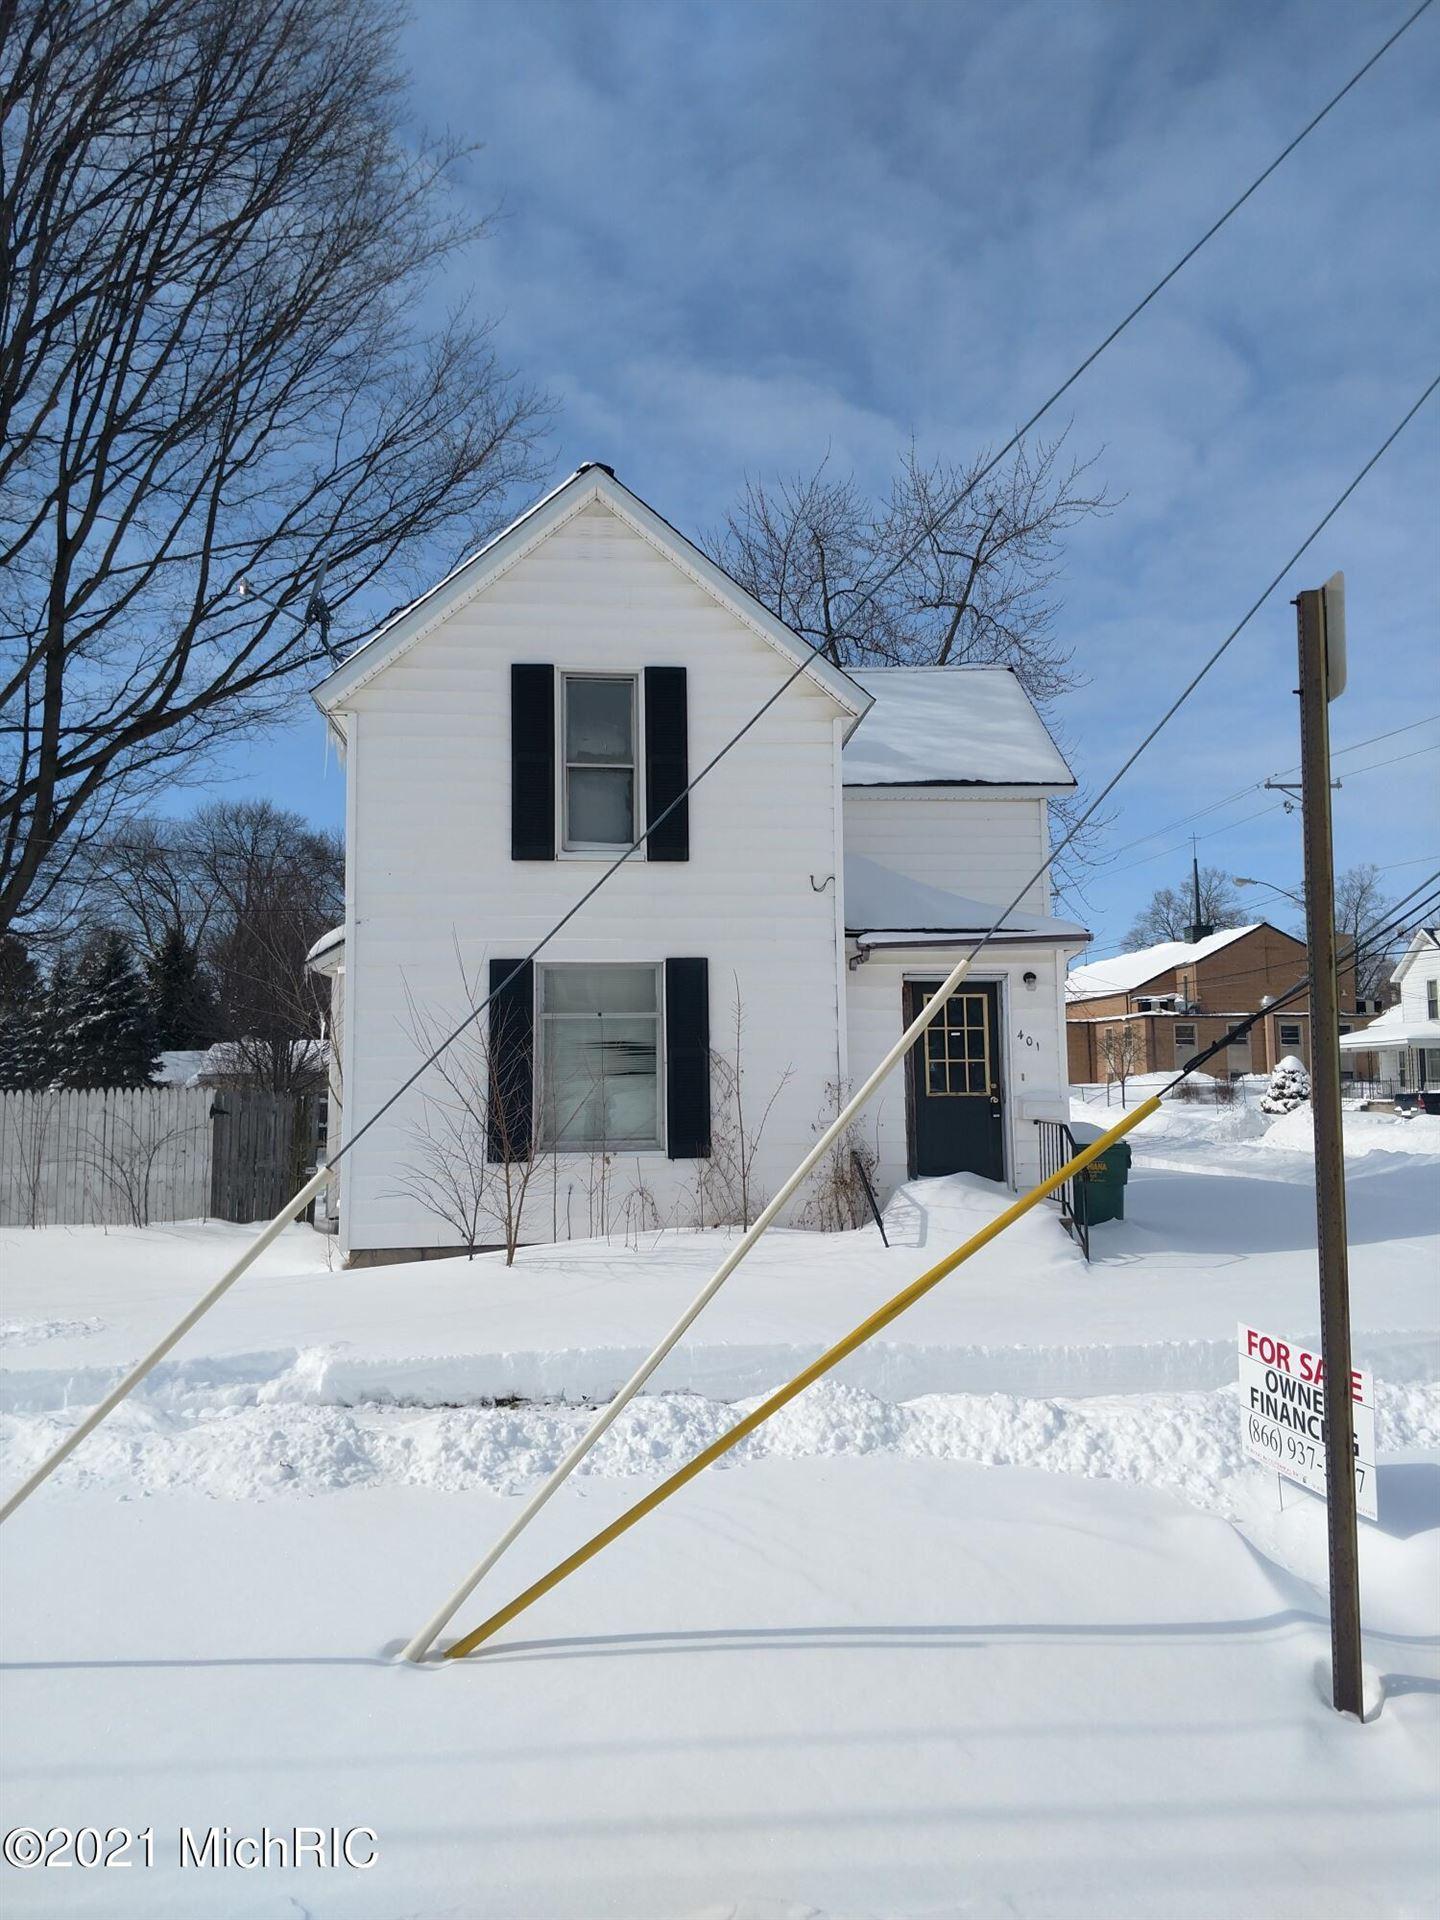 401 S Monroe Street, Sturgis, MI 49091 - MLS#: 21005043